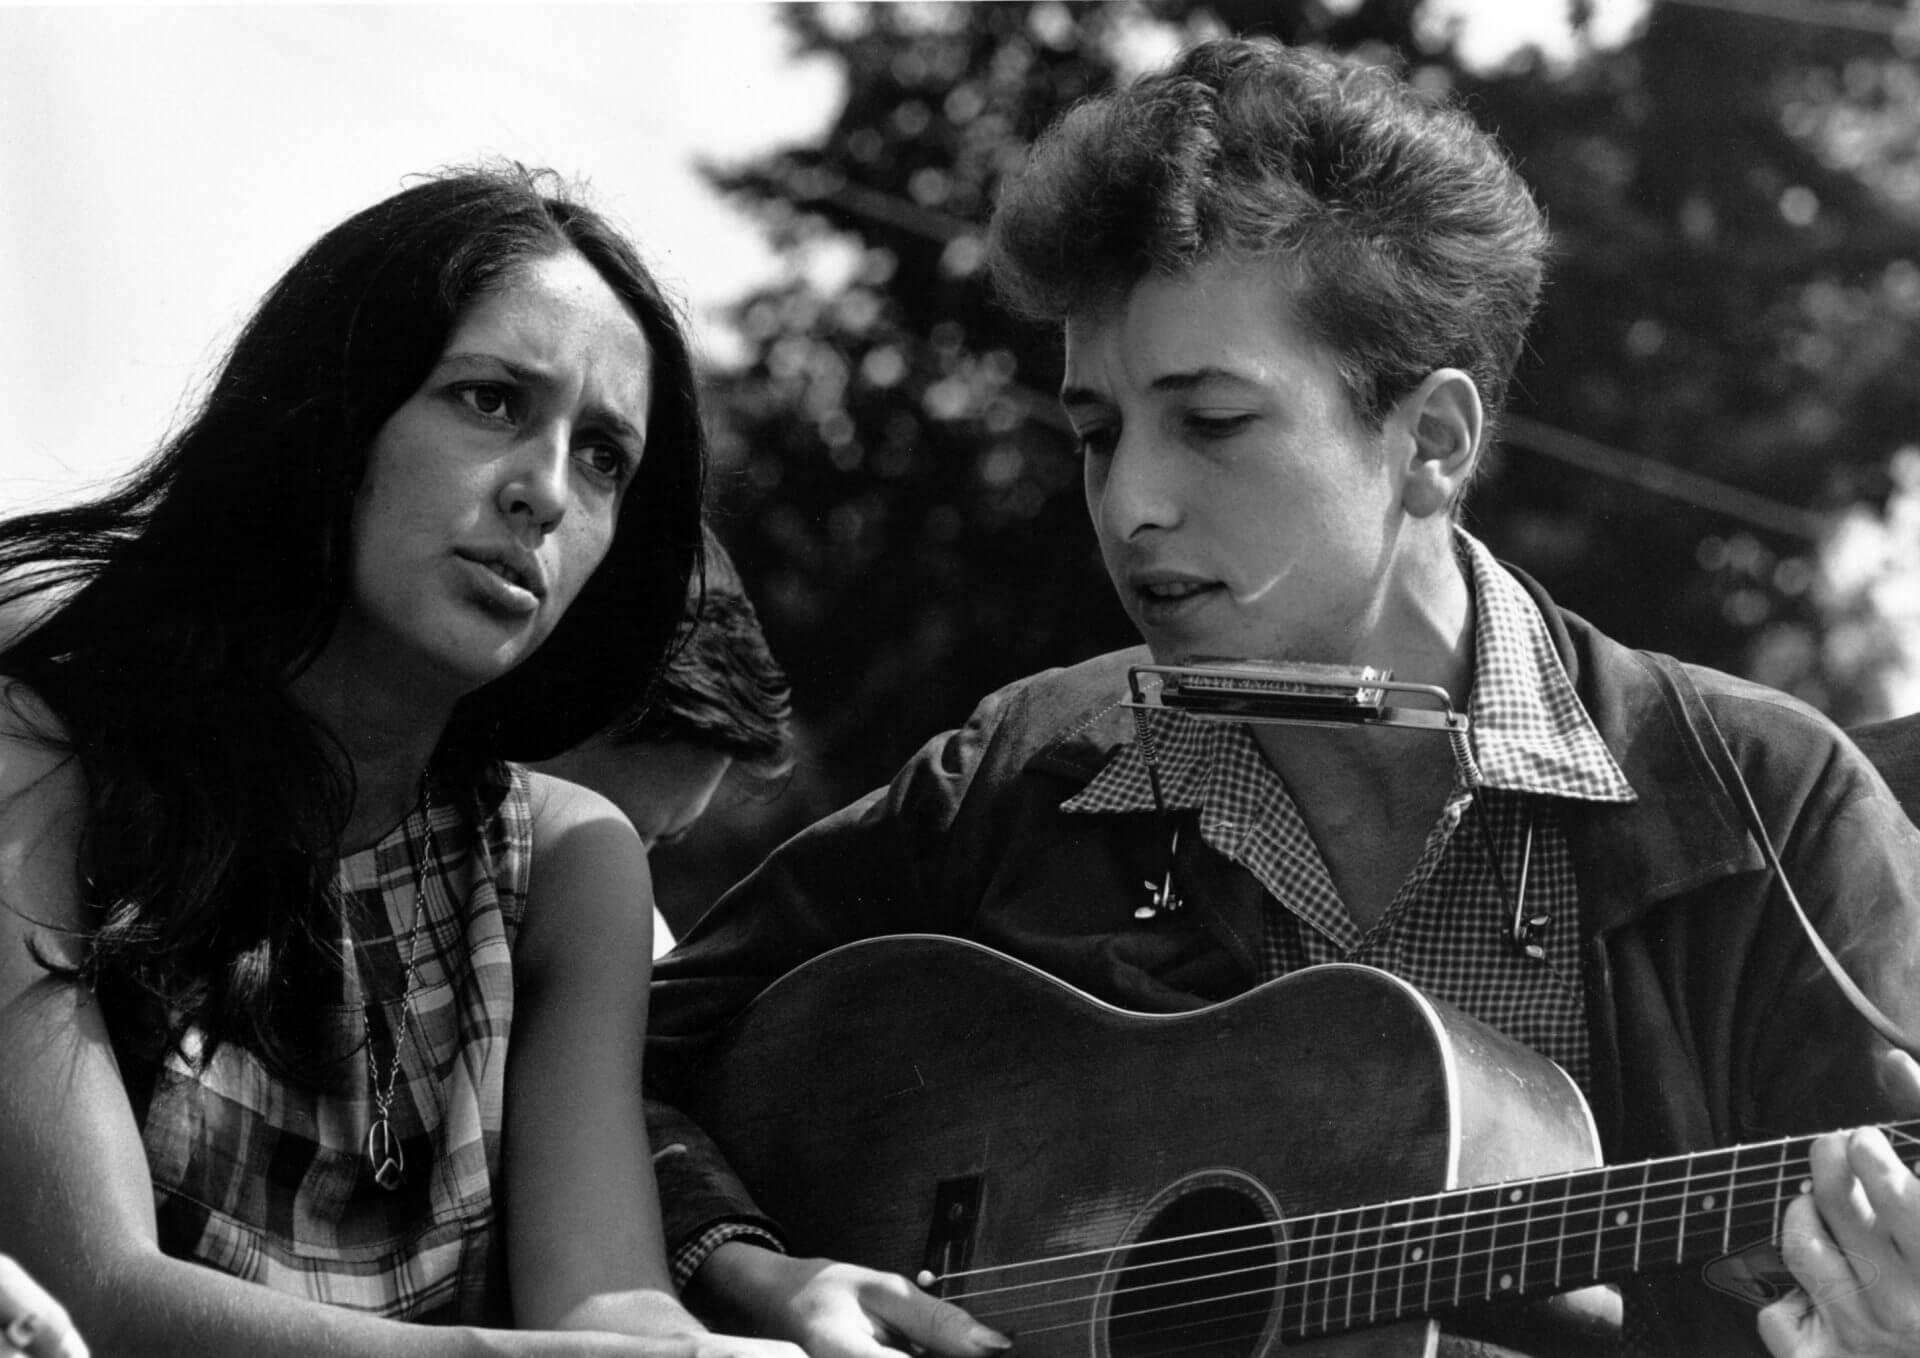 Bob Dylan iJoan Baez (fot.Rowland Scherman - Wikipedia, CC)